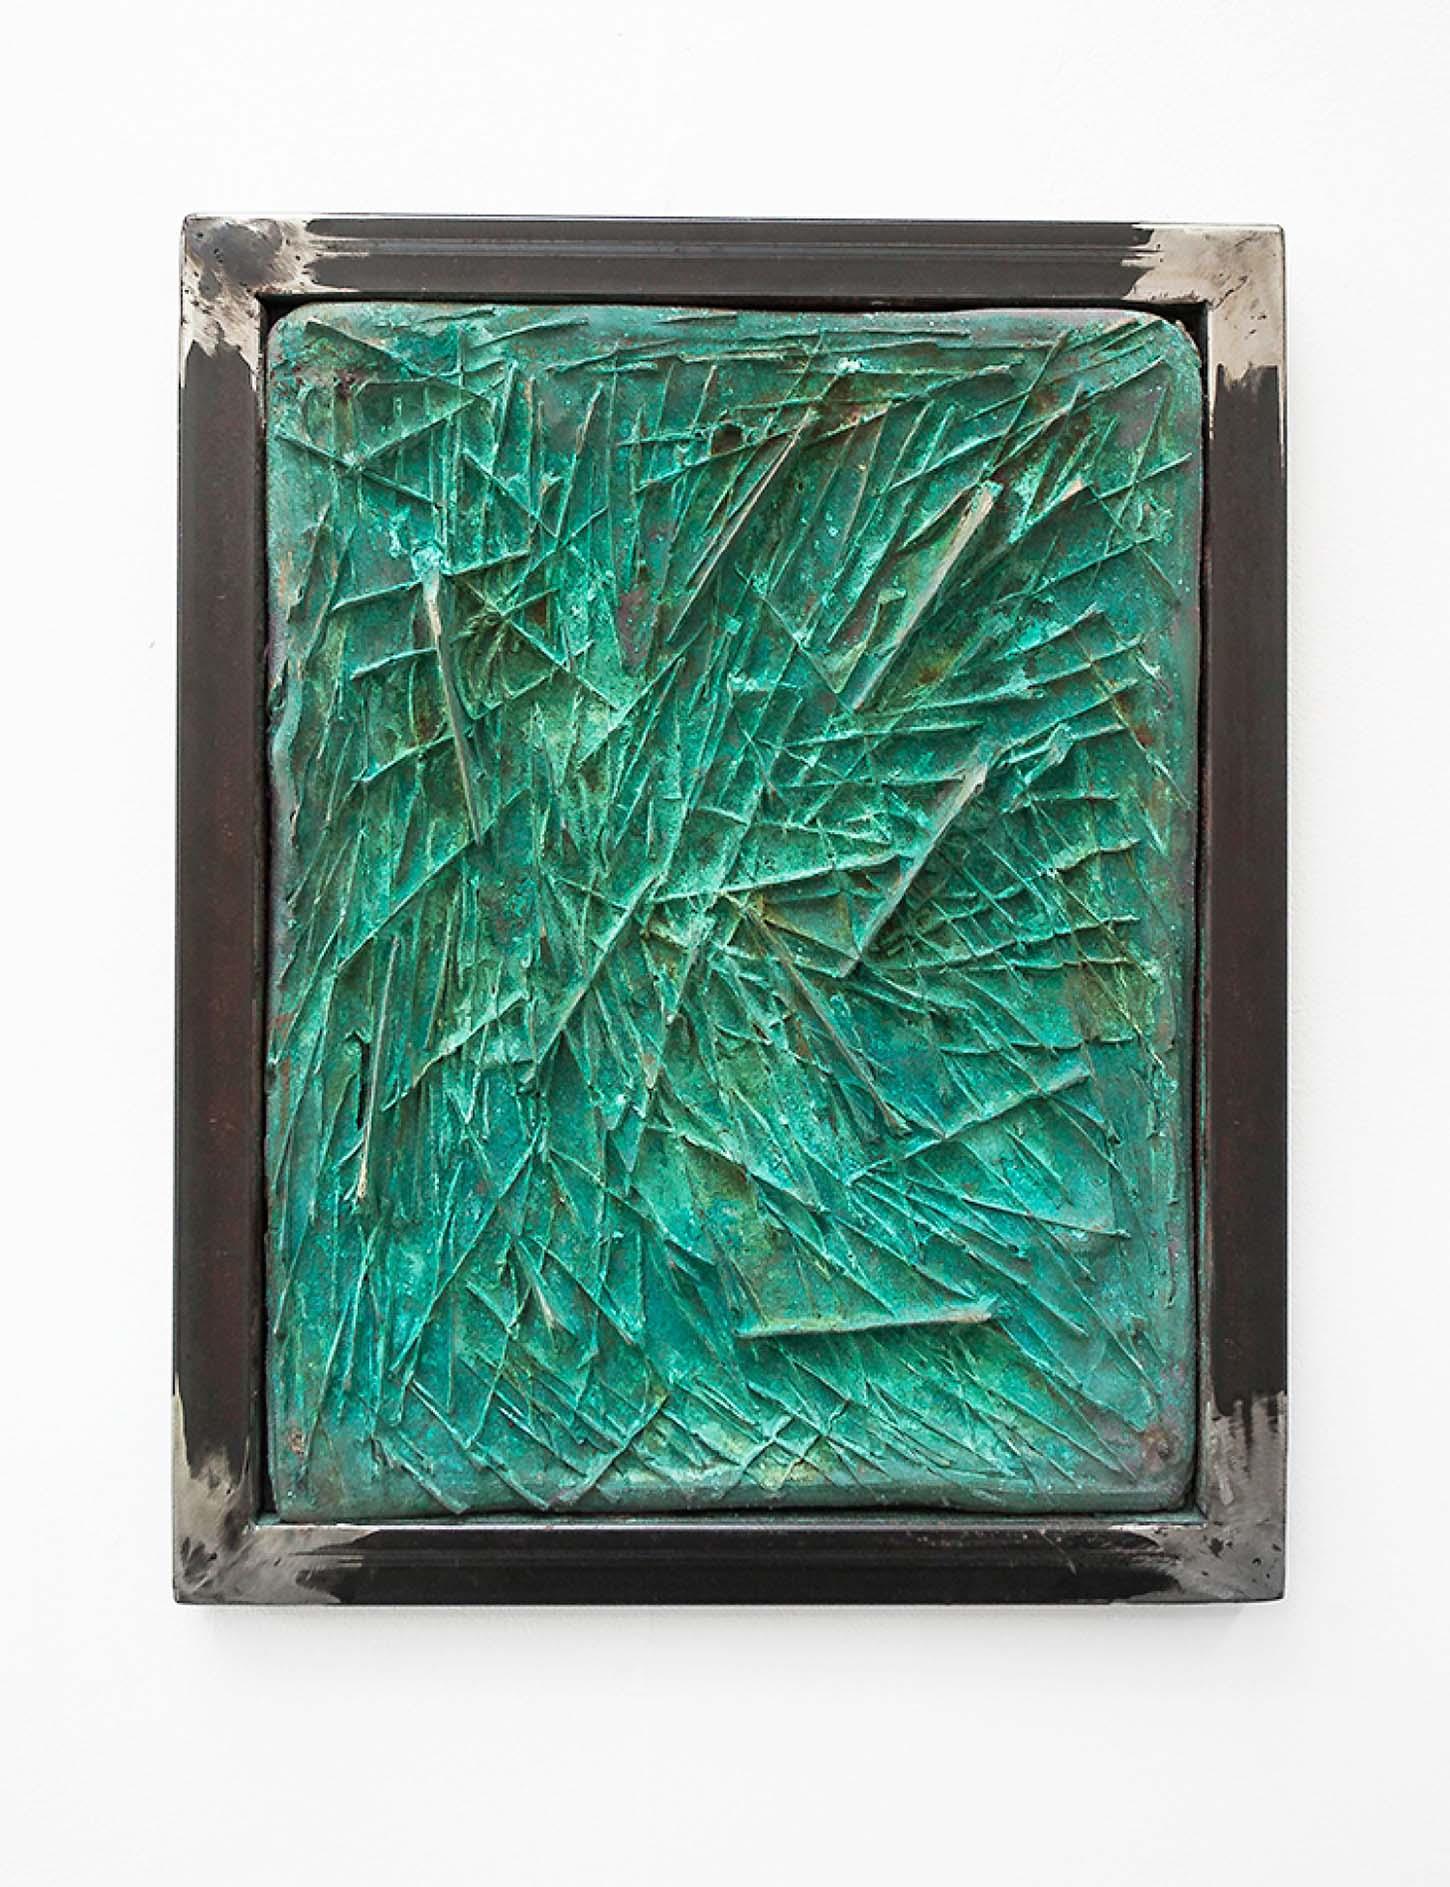 • La galeriePrécipitéTom Giampieri et Amandine Guruceaga19 janvier - 10 mars 2018Amandine Guruceaga, swing of axe #1, 2016, Acier, matière composite, bronze 35 x 43 cm